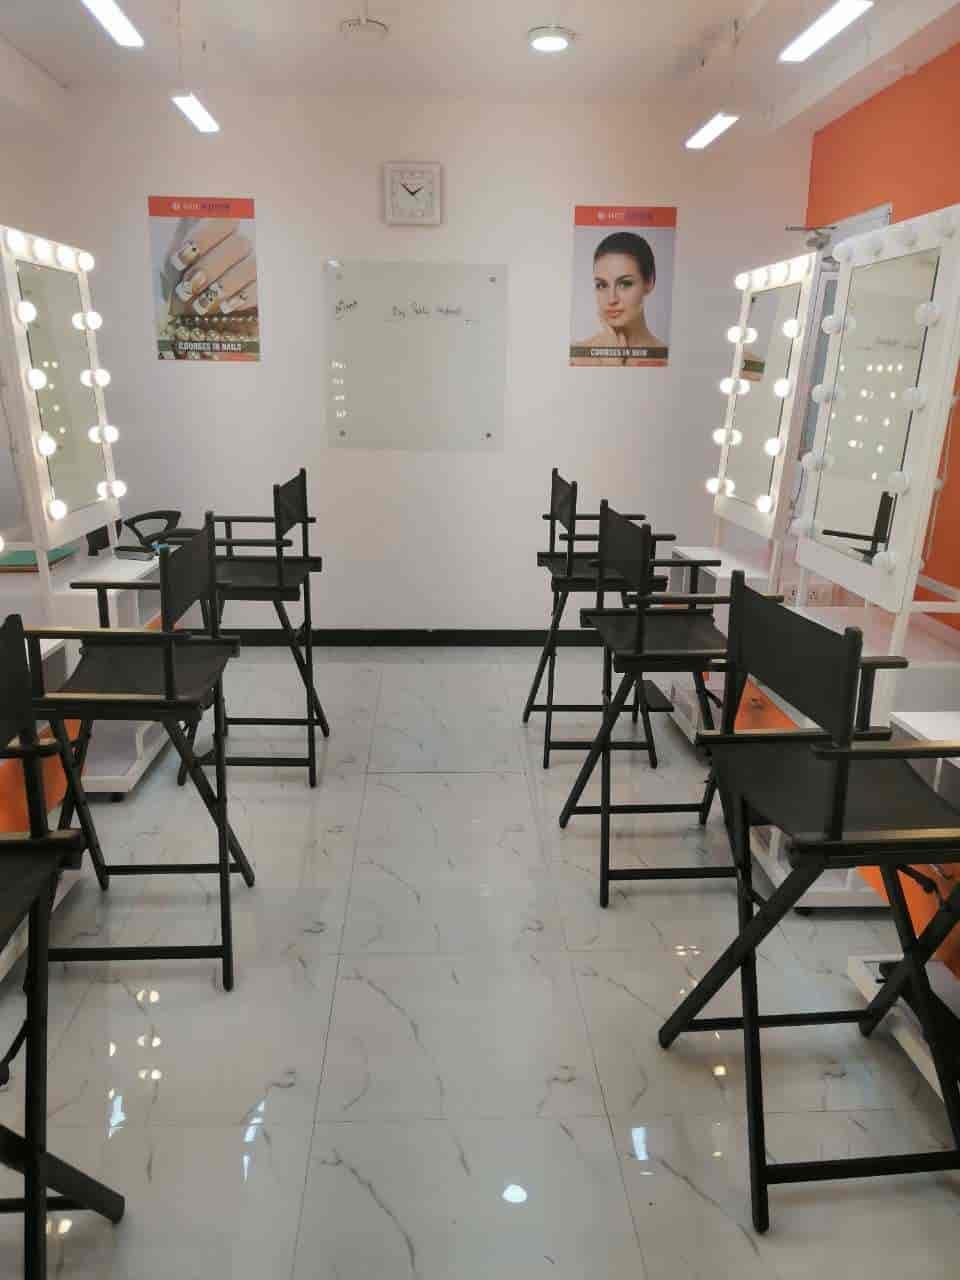 centrul de slăbire vlcc din delhi